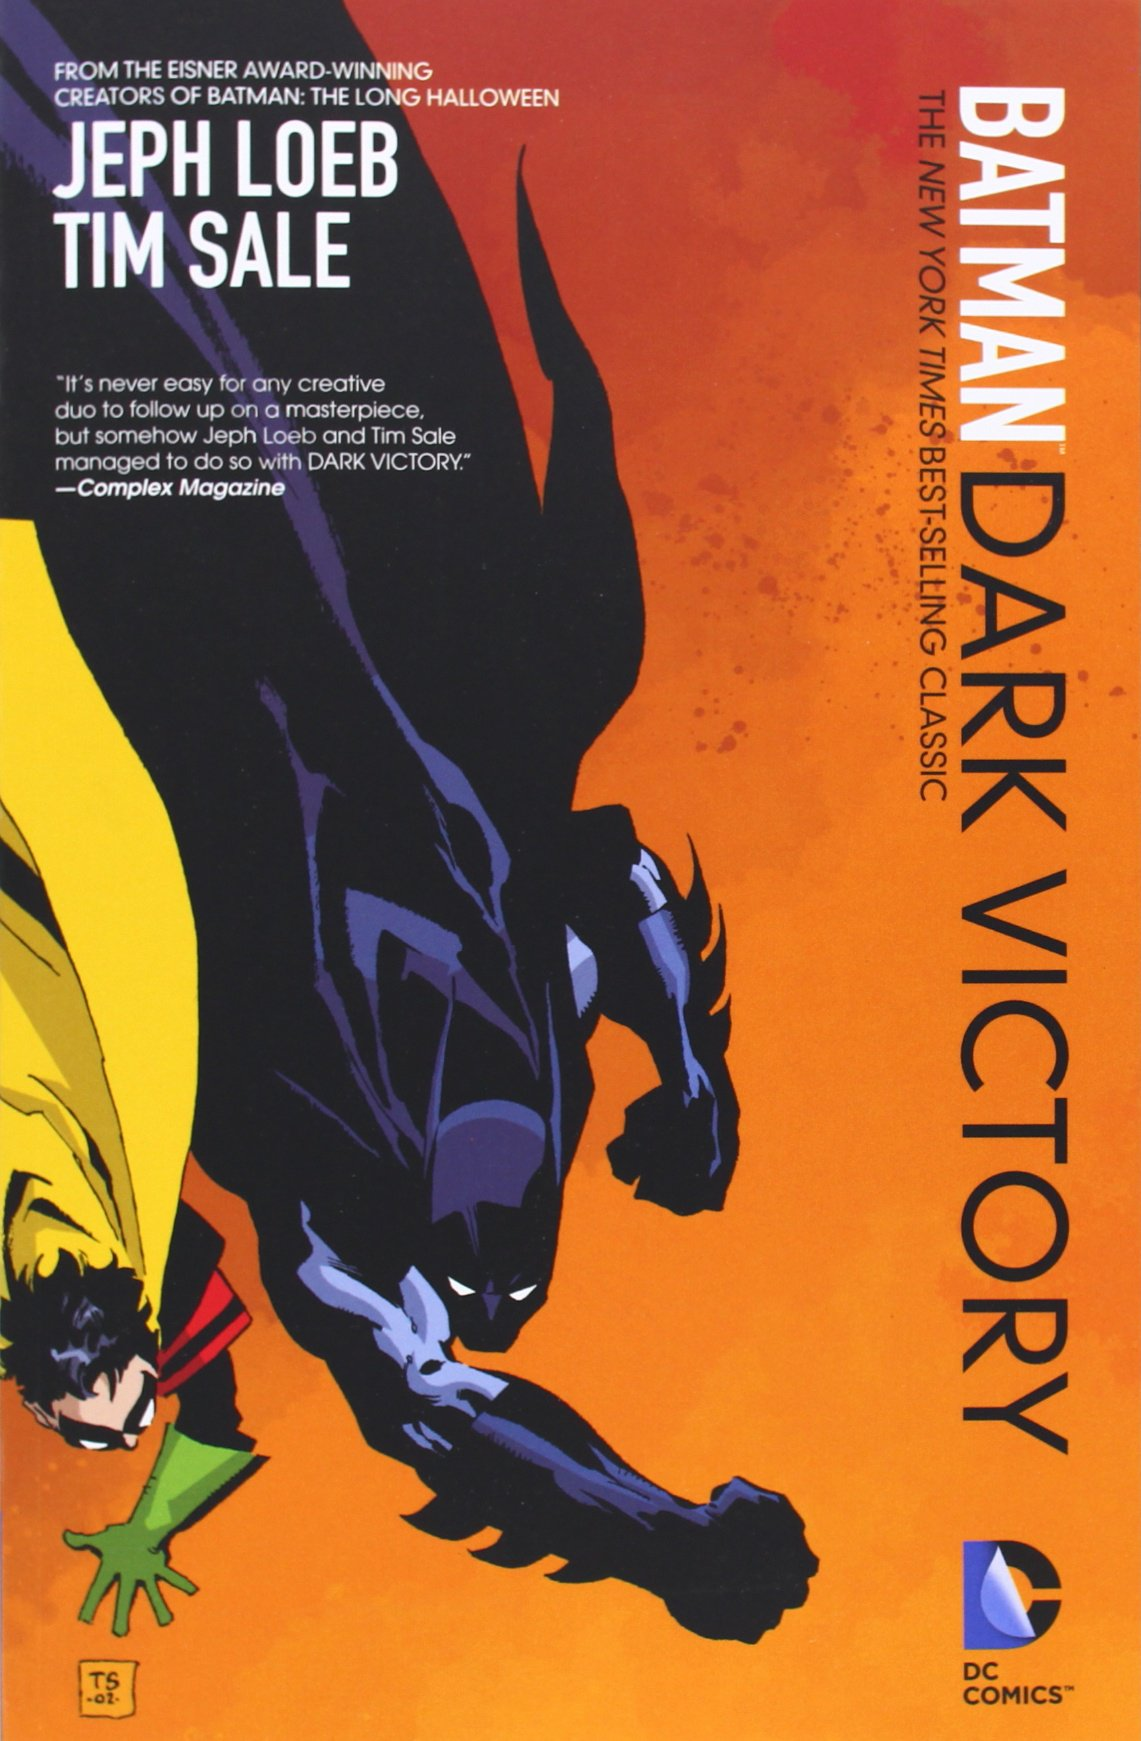 Batman ISBN-13 9781401244019